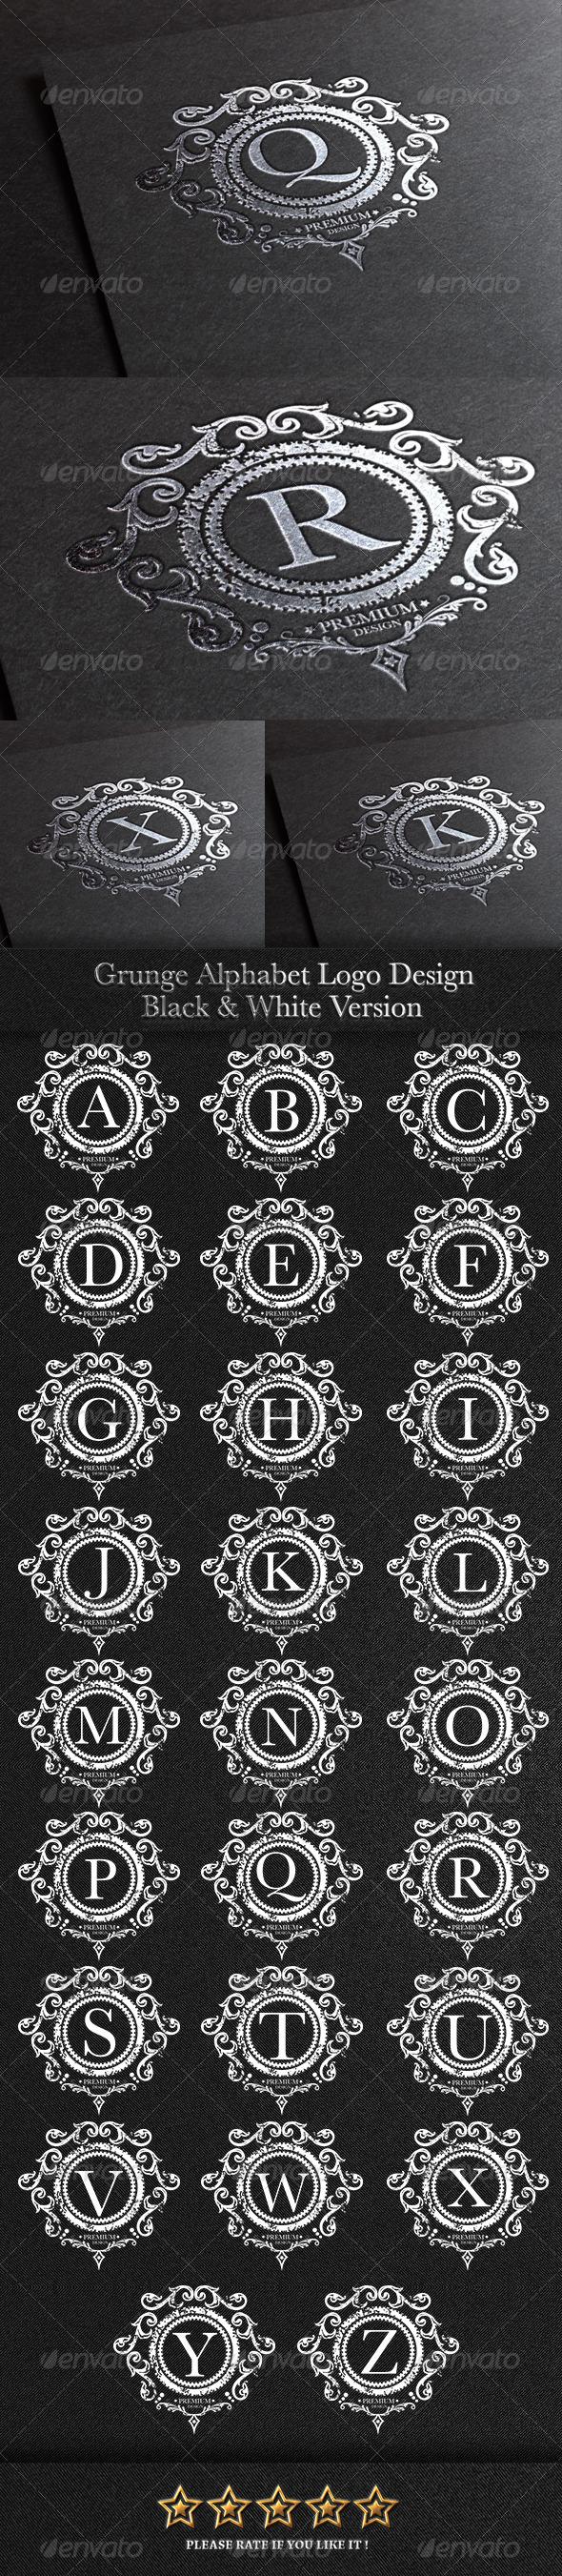 GraphicRiver Grunge Alphabet Symbol 7821811